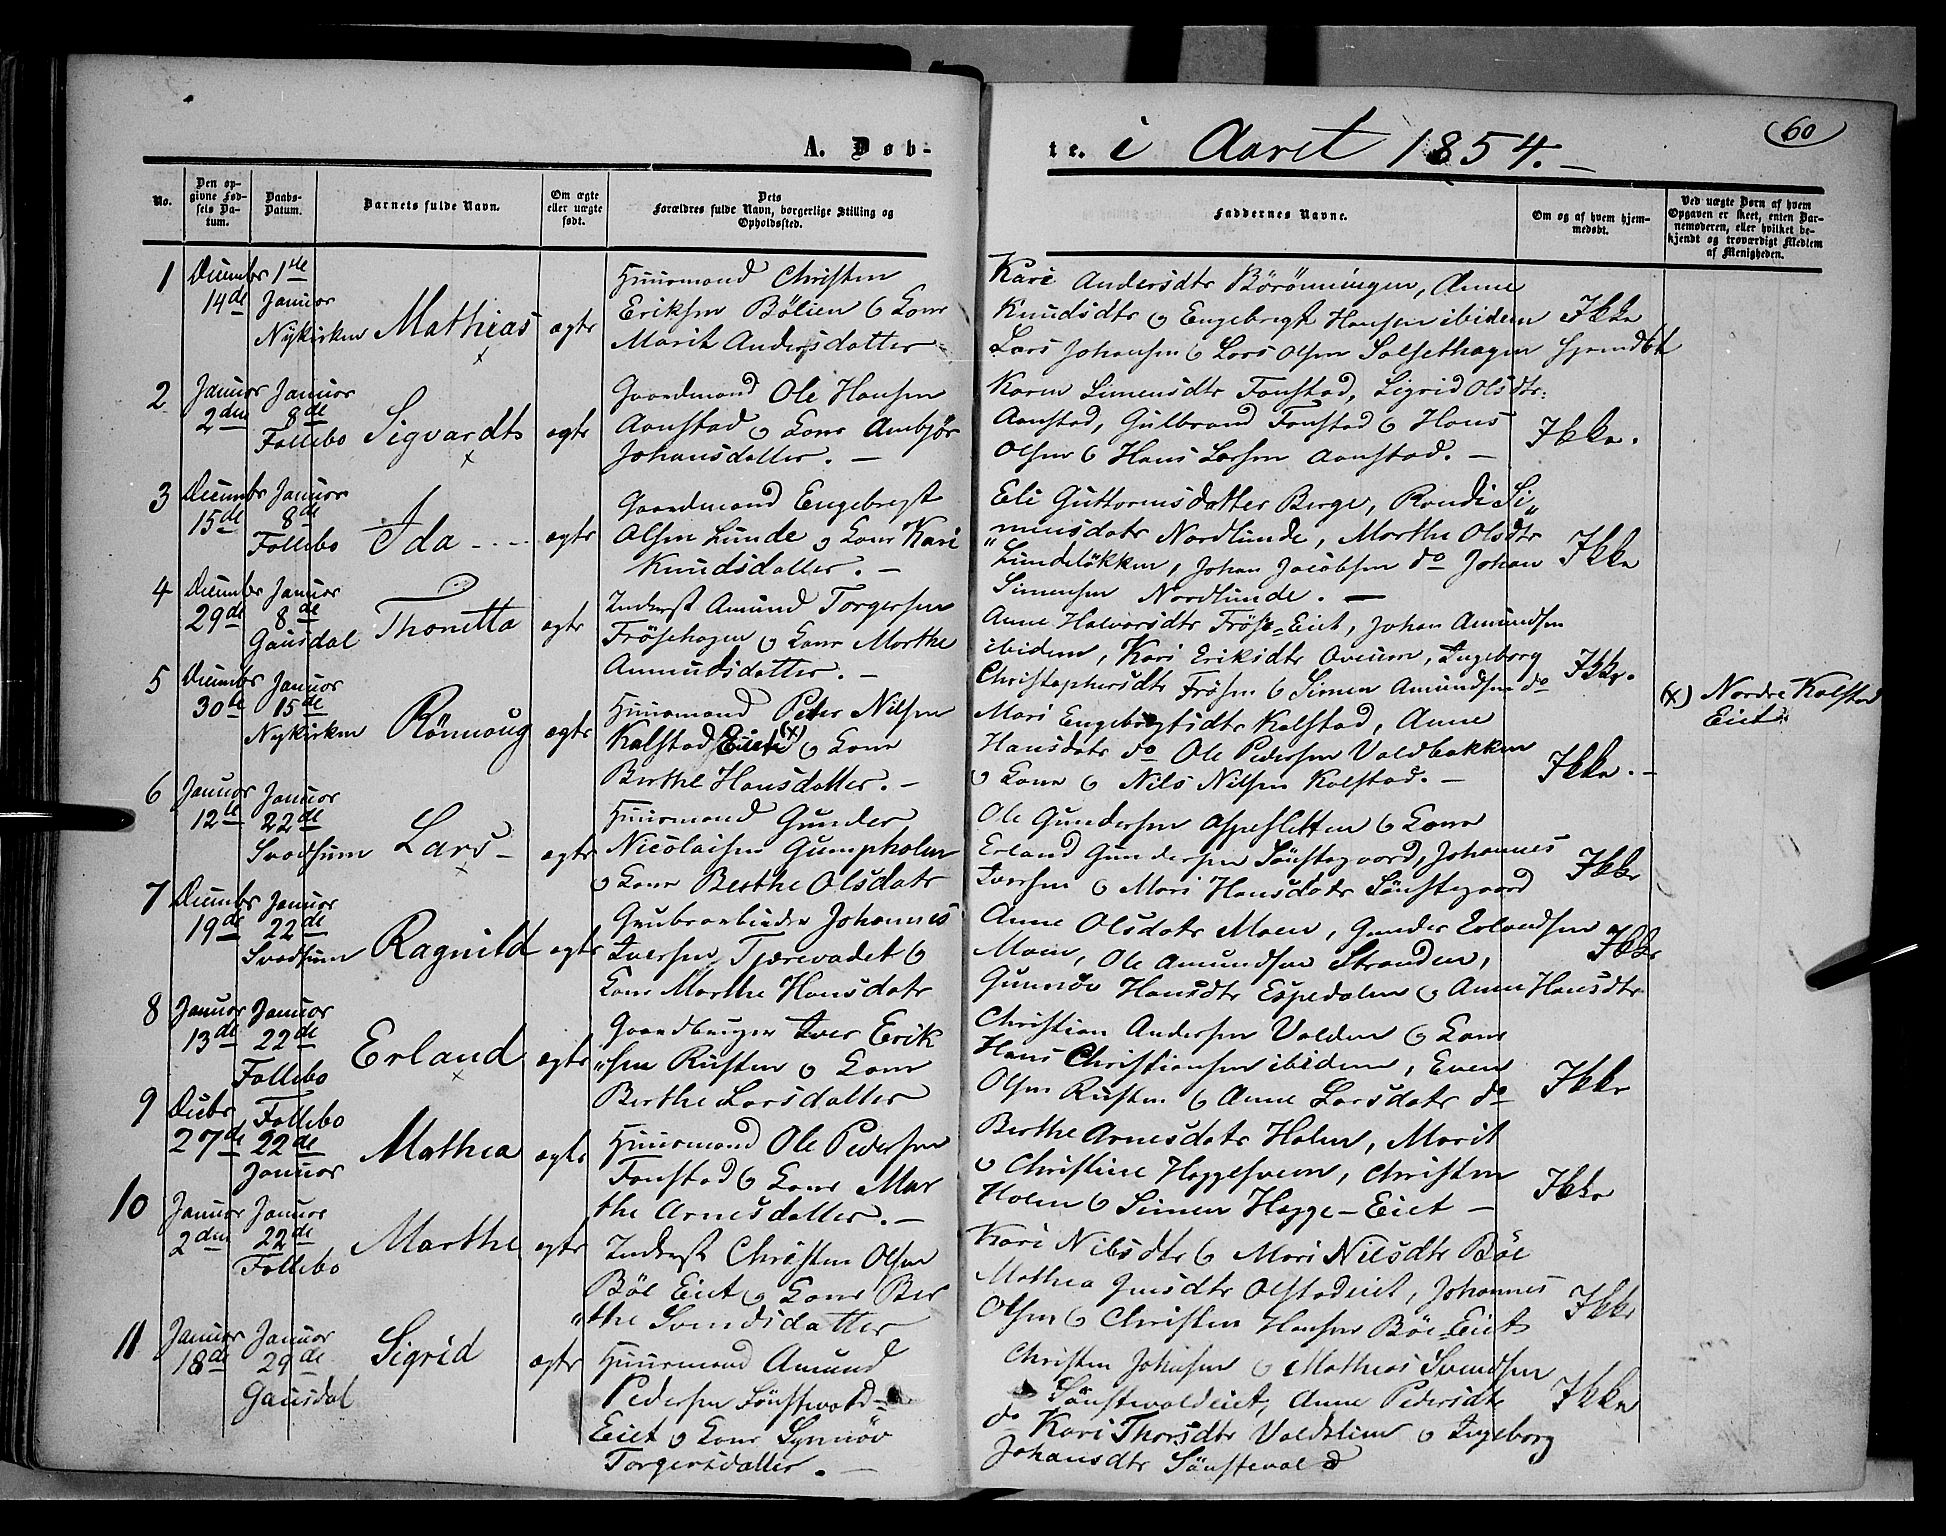 SAH, Gausdal prestekontor, Ministerialbok nr. 8, 1850-1861, s. 60